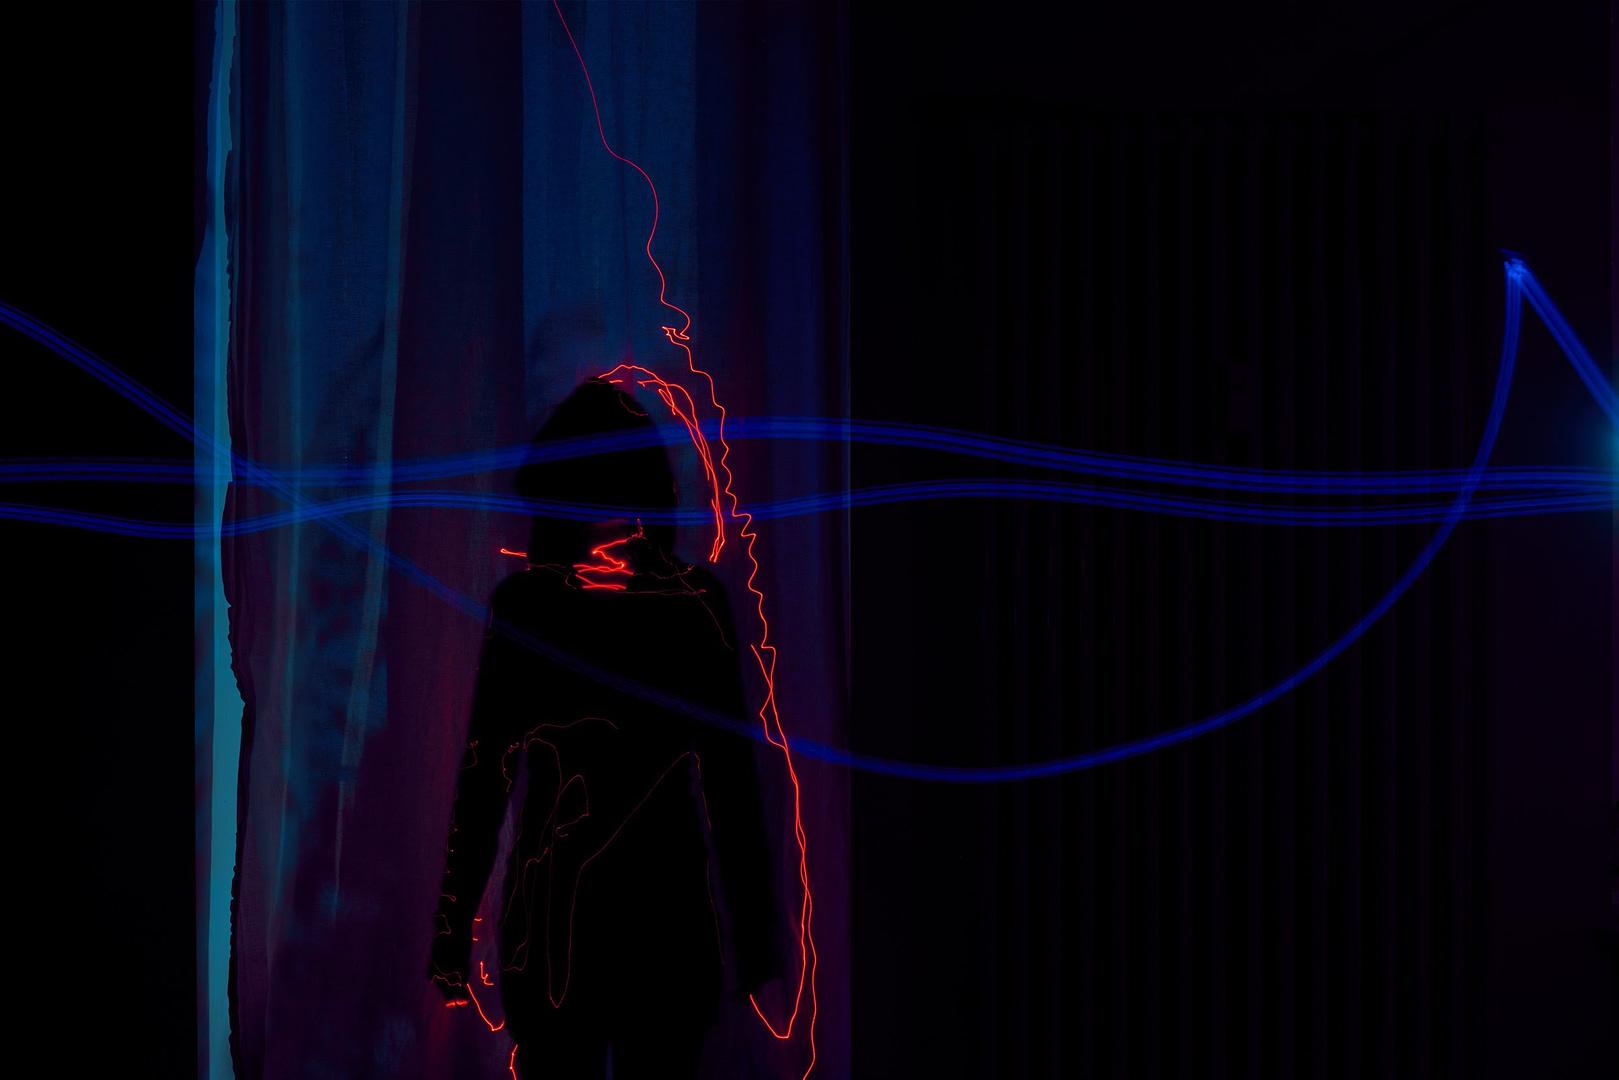 konzeptionelle Fotografie Laser Ghost0004